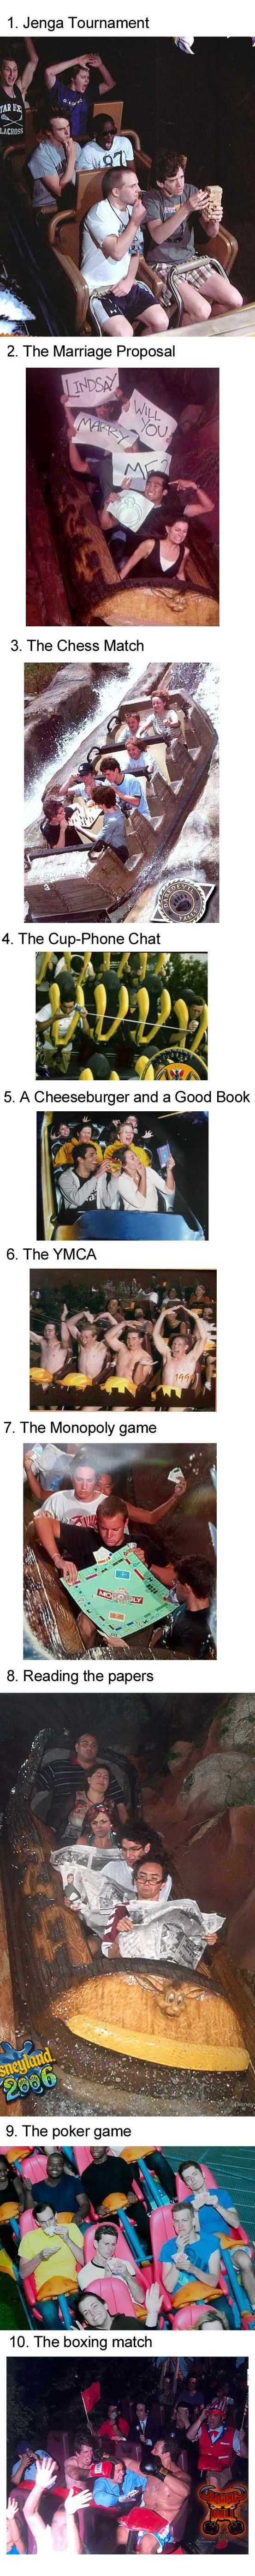 Best roller coaster pics